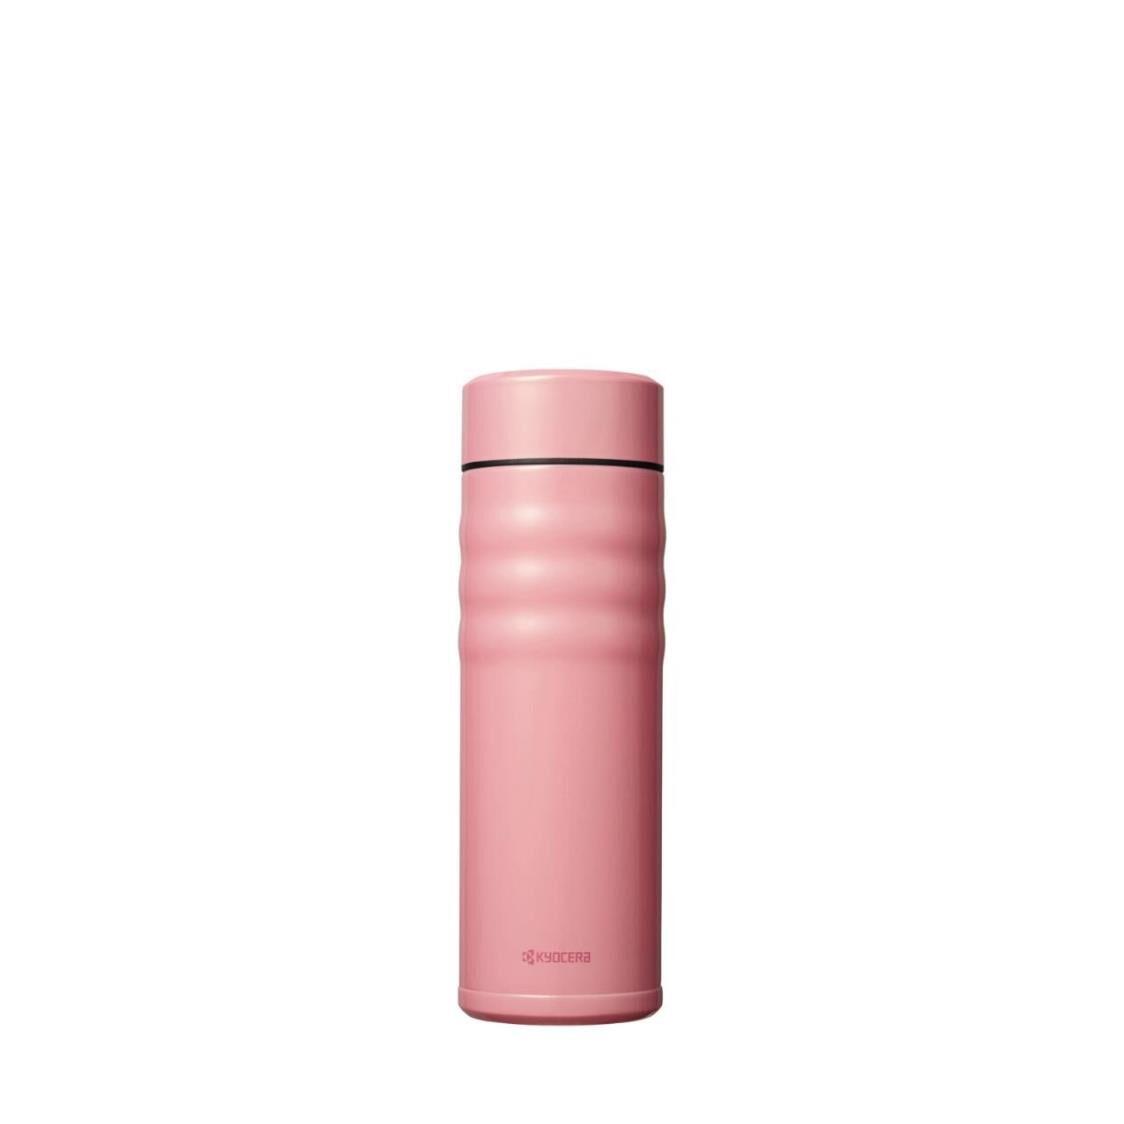 Kyocera Advanced Ceramic 500ml Cerabrid Mug - Coral Pink CSB-S500-BCPK